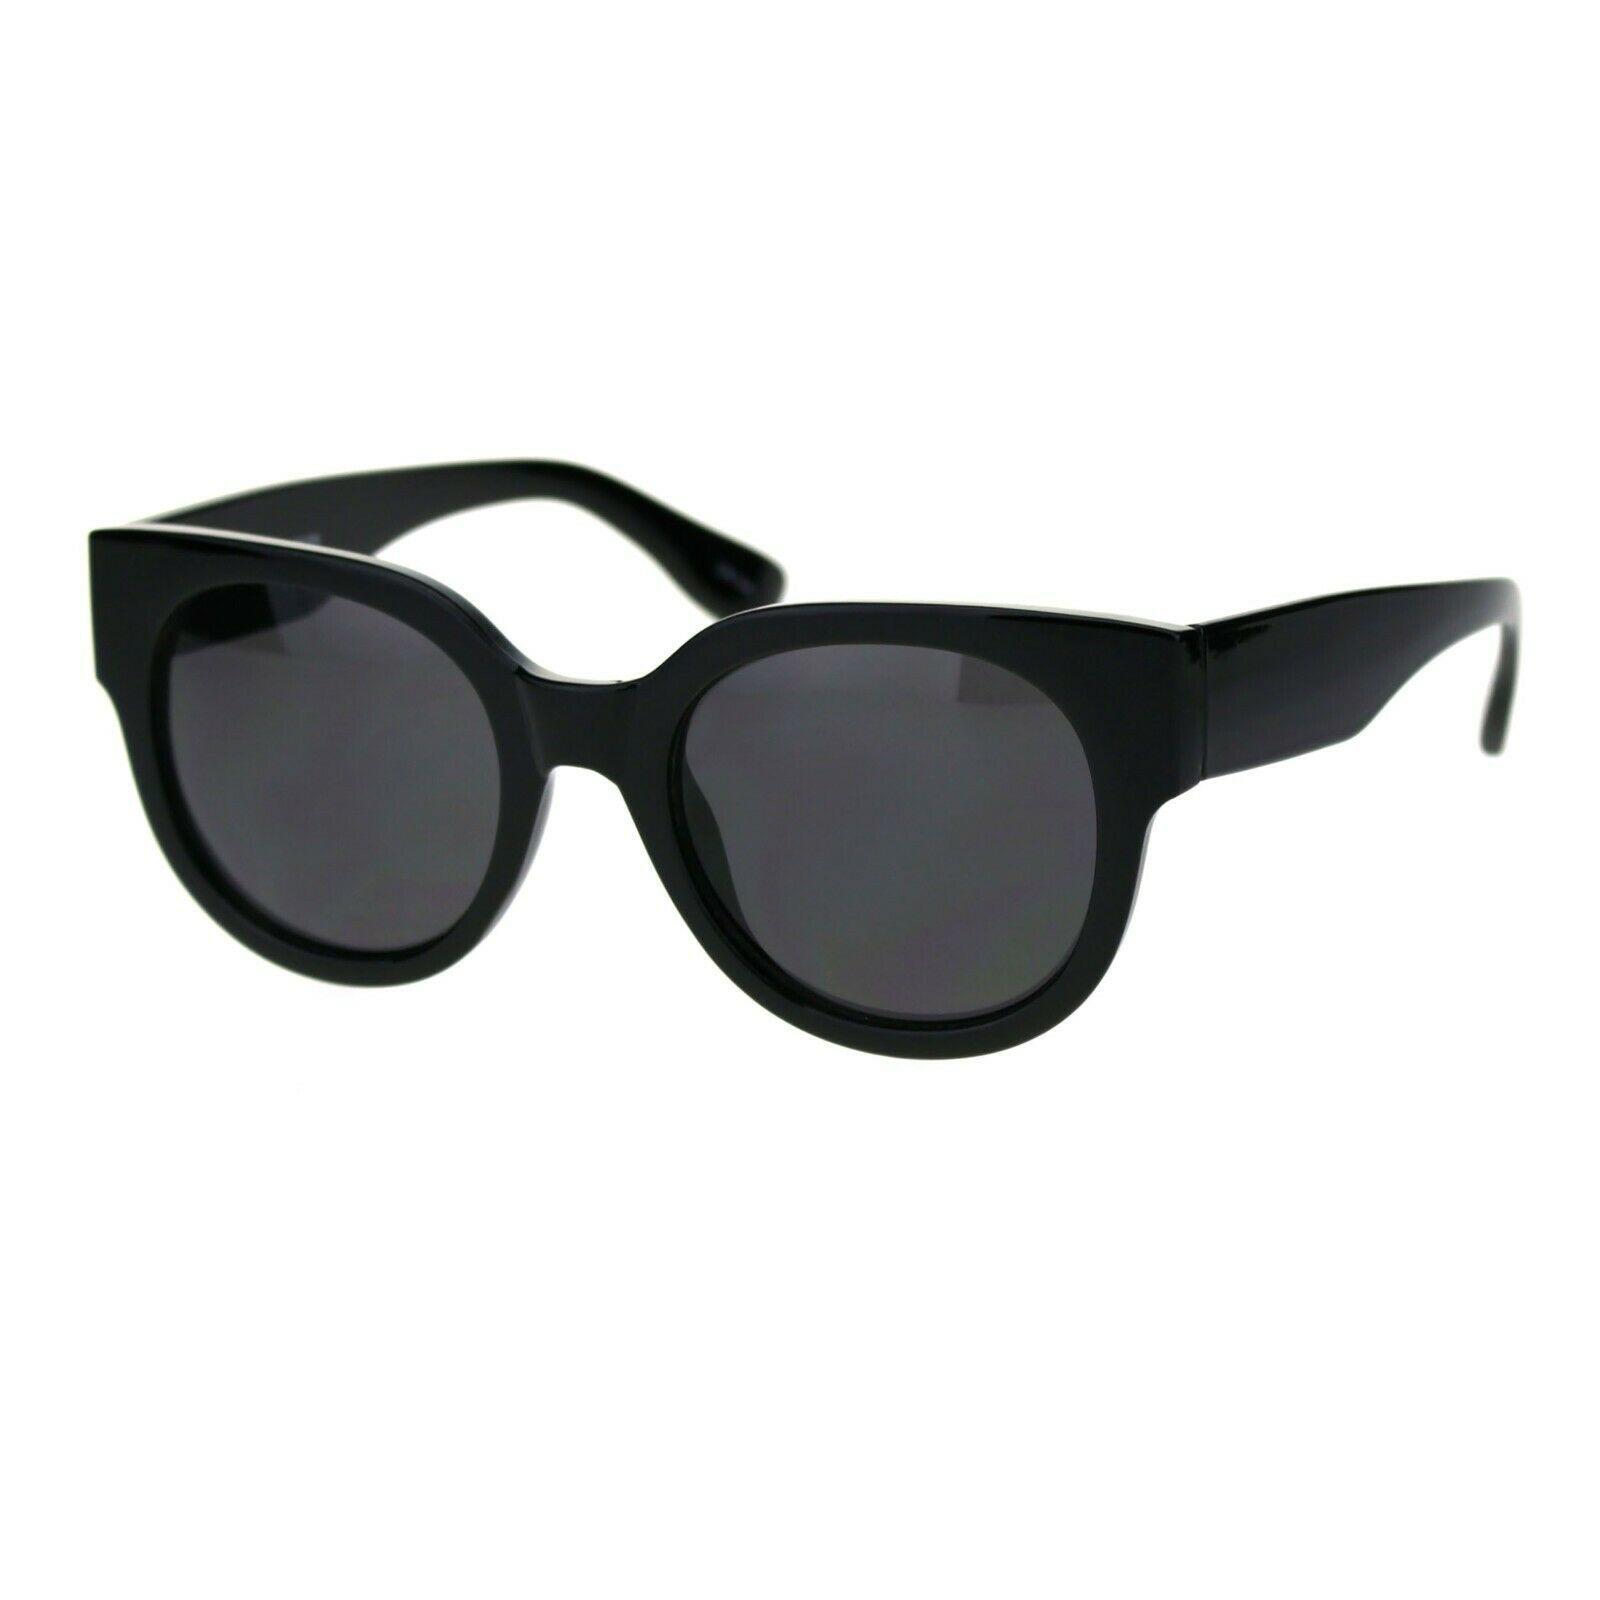 Womens Round Horn Rim Sunglasses Trendy Retro Fashion Shades UV 400 image 3